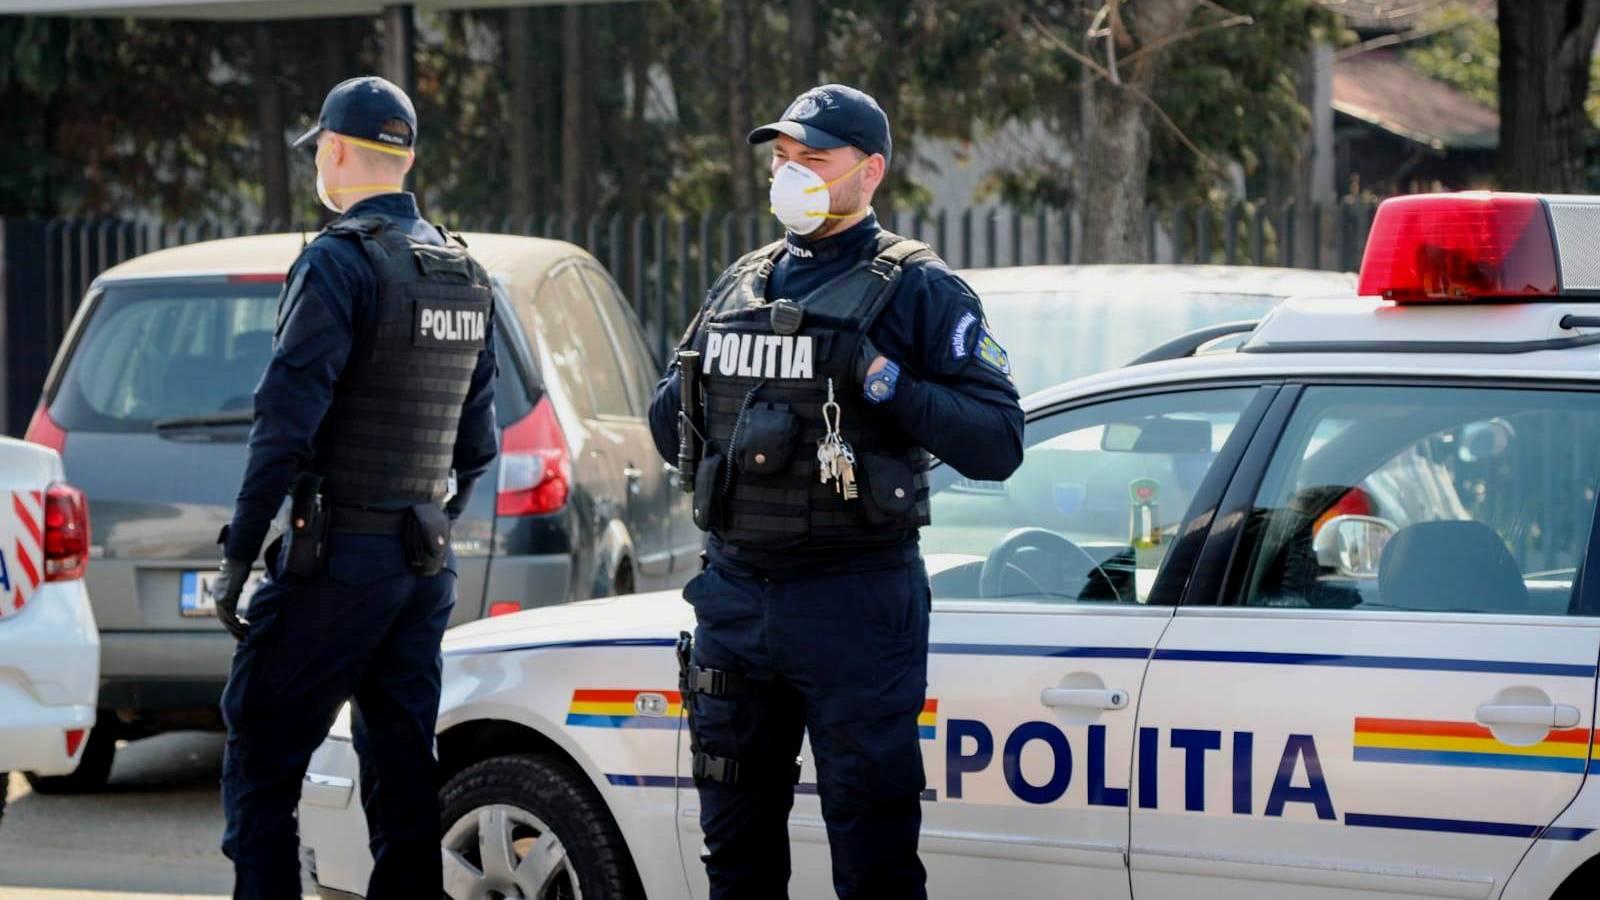 Politia Romana lumina paste